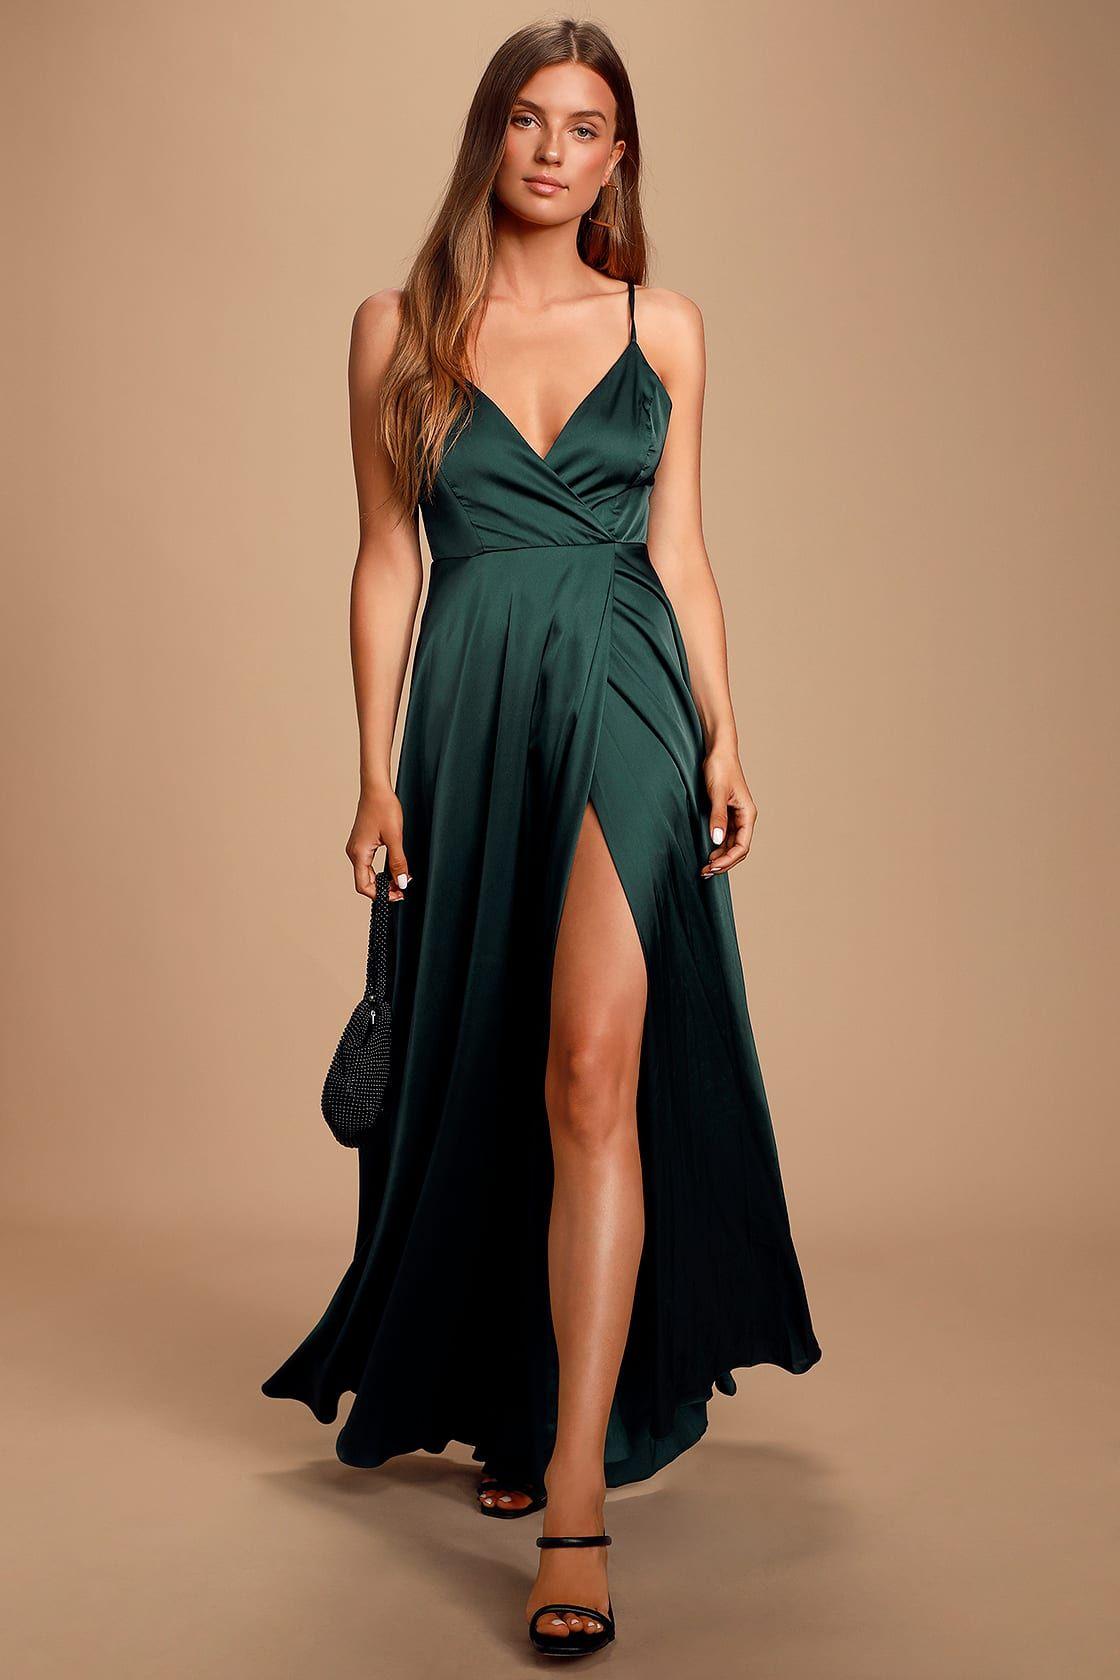 Ode To Love Emerald Green Satin Maxi Dress